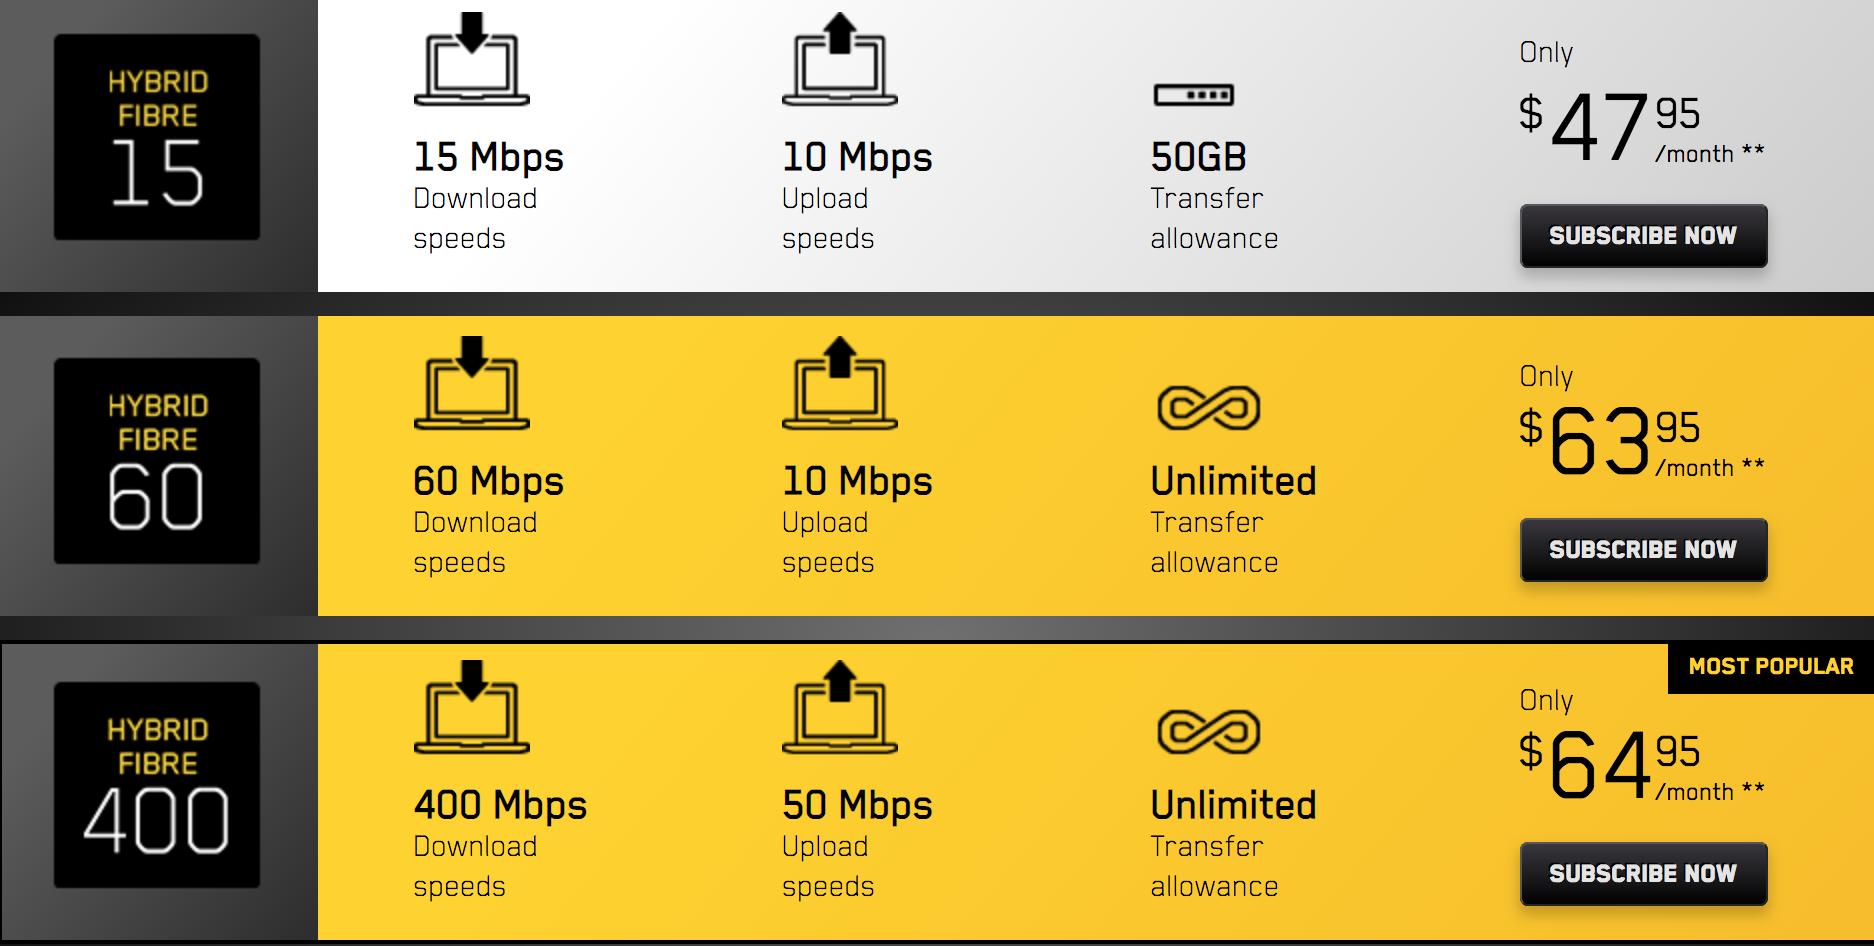 Videotron Upgrades 400 Mbps Internet For Same Price As Lower Plans